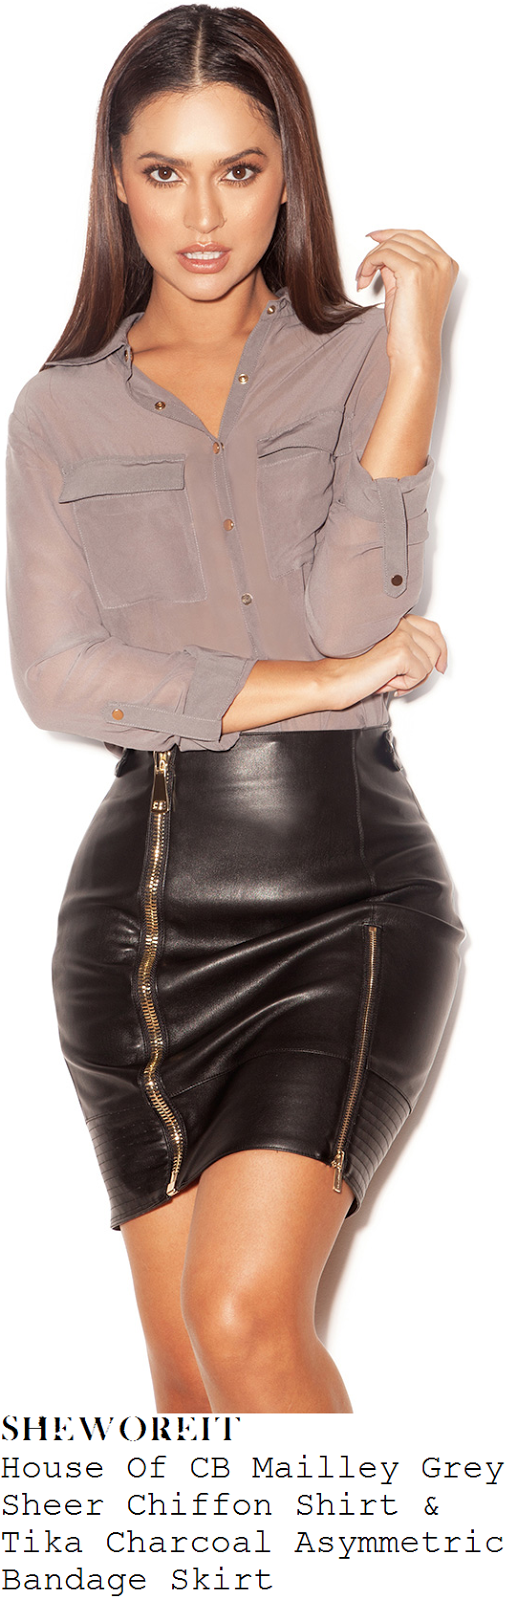 kendra-wilkinson-mailley-grey-sheer-chiffon-shirt-and-tika-charcoat-asymmetric-bandage-skirt